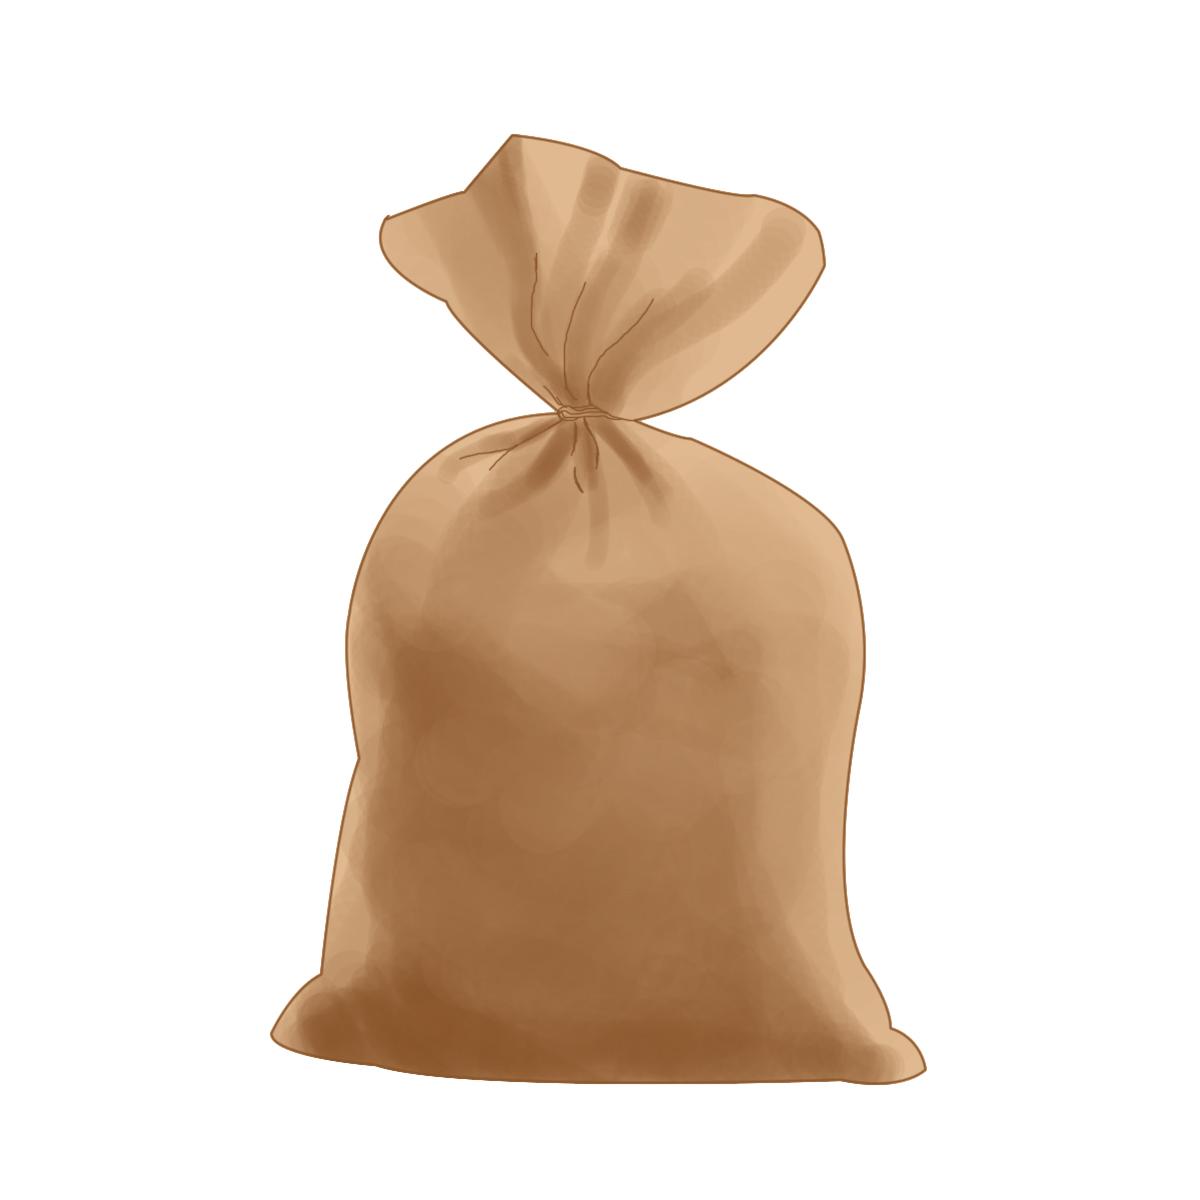 Bag clipart sack 4/3/16 bag Rivers Three Episcopal: